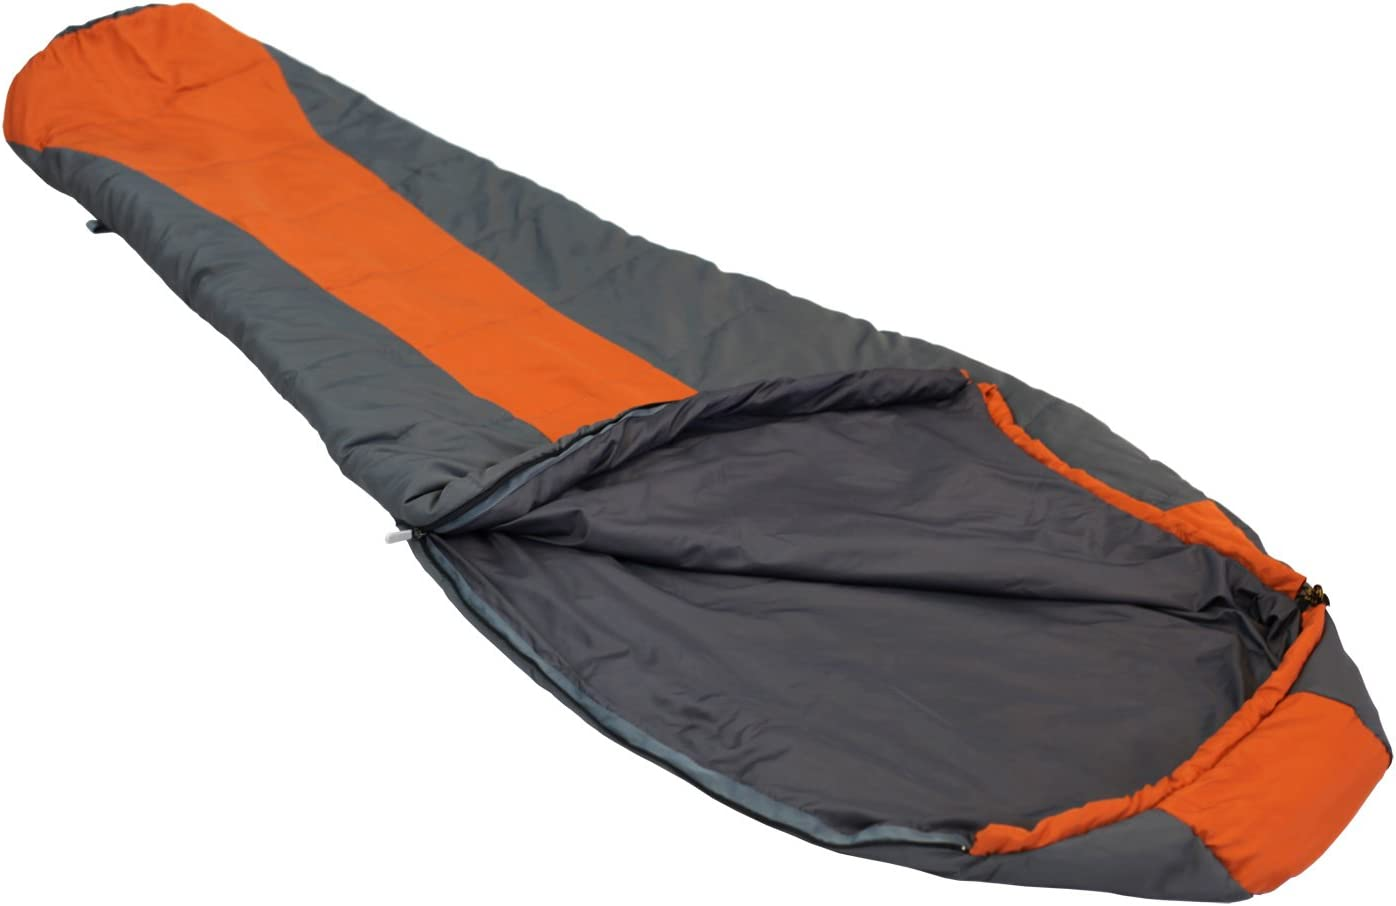 Ledge Sports Scorpion 45 F Degree Ultra Light Design, Ultra Compact Sleeping Bag 84 X 32 X 20